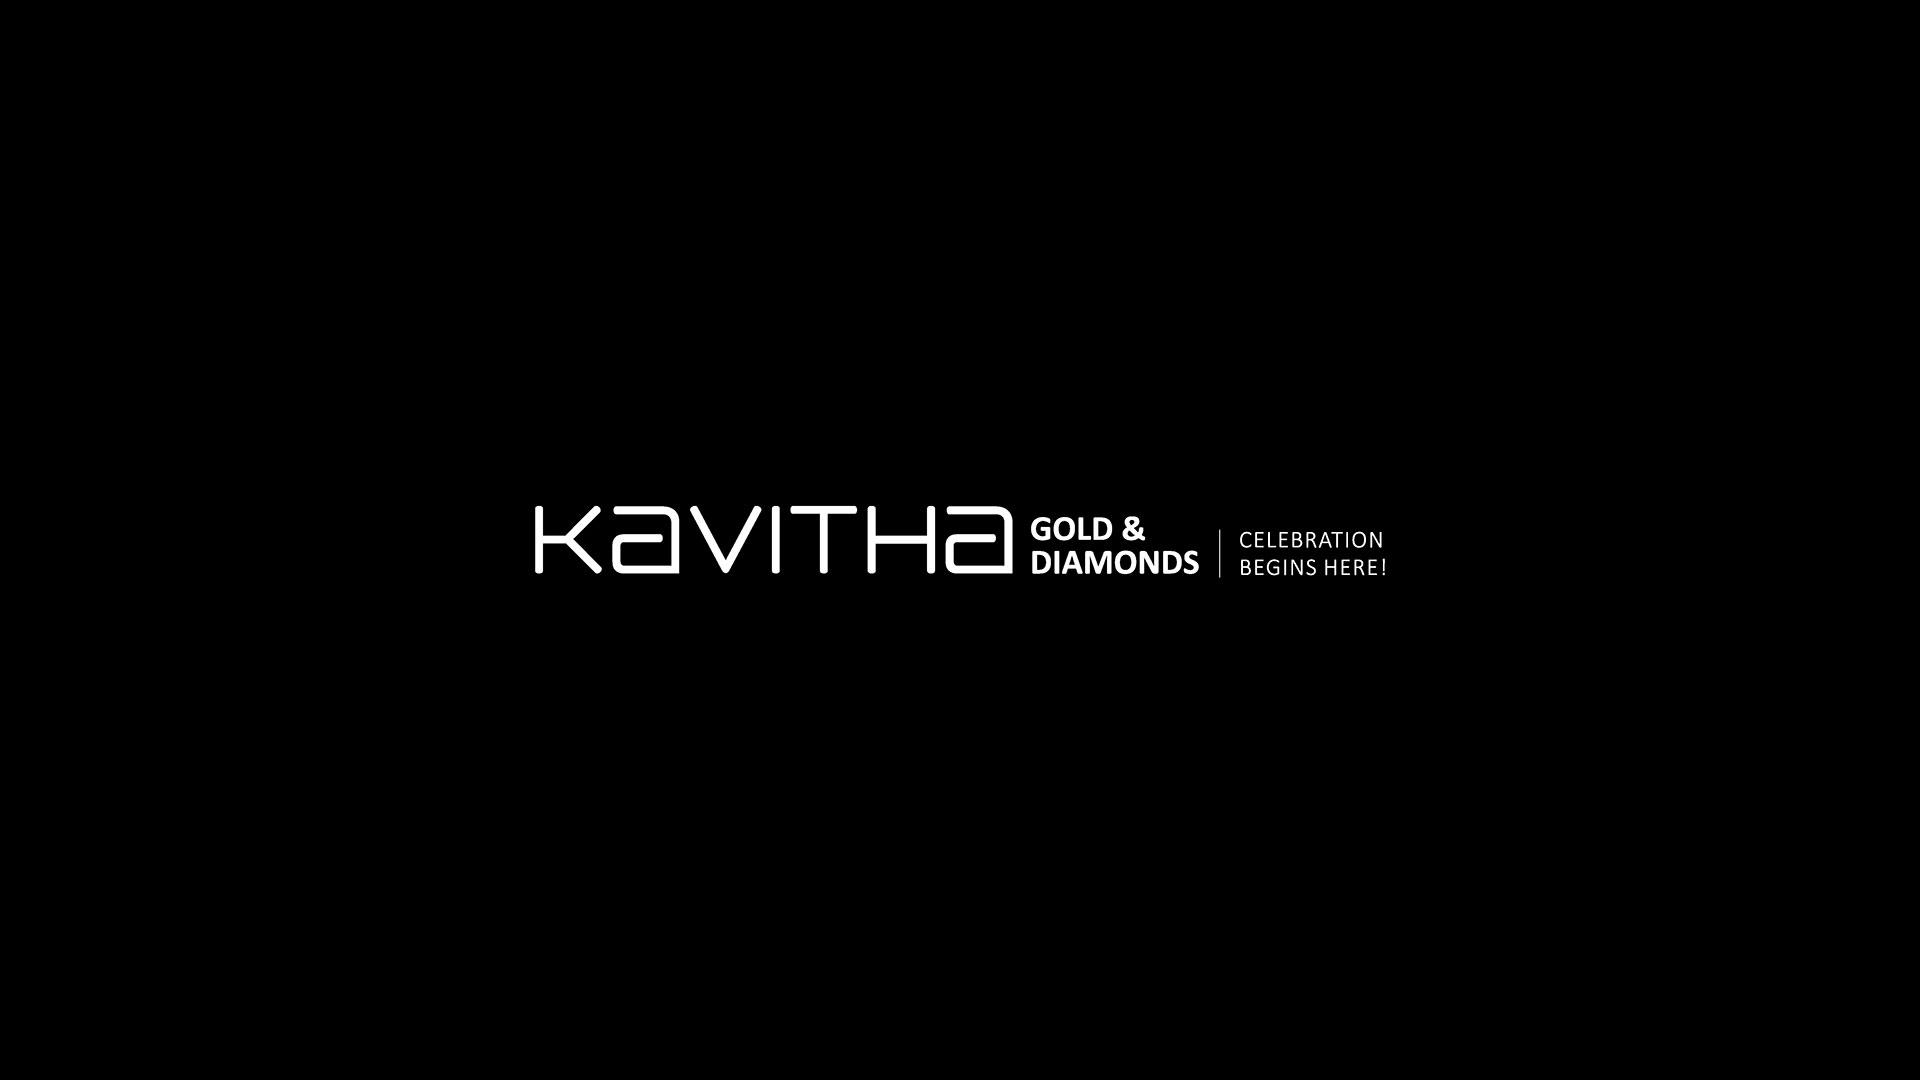 Kavtiha Gold & Diamonds Logo on black background